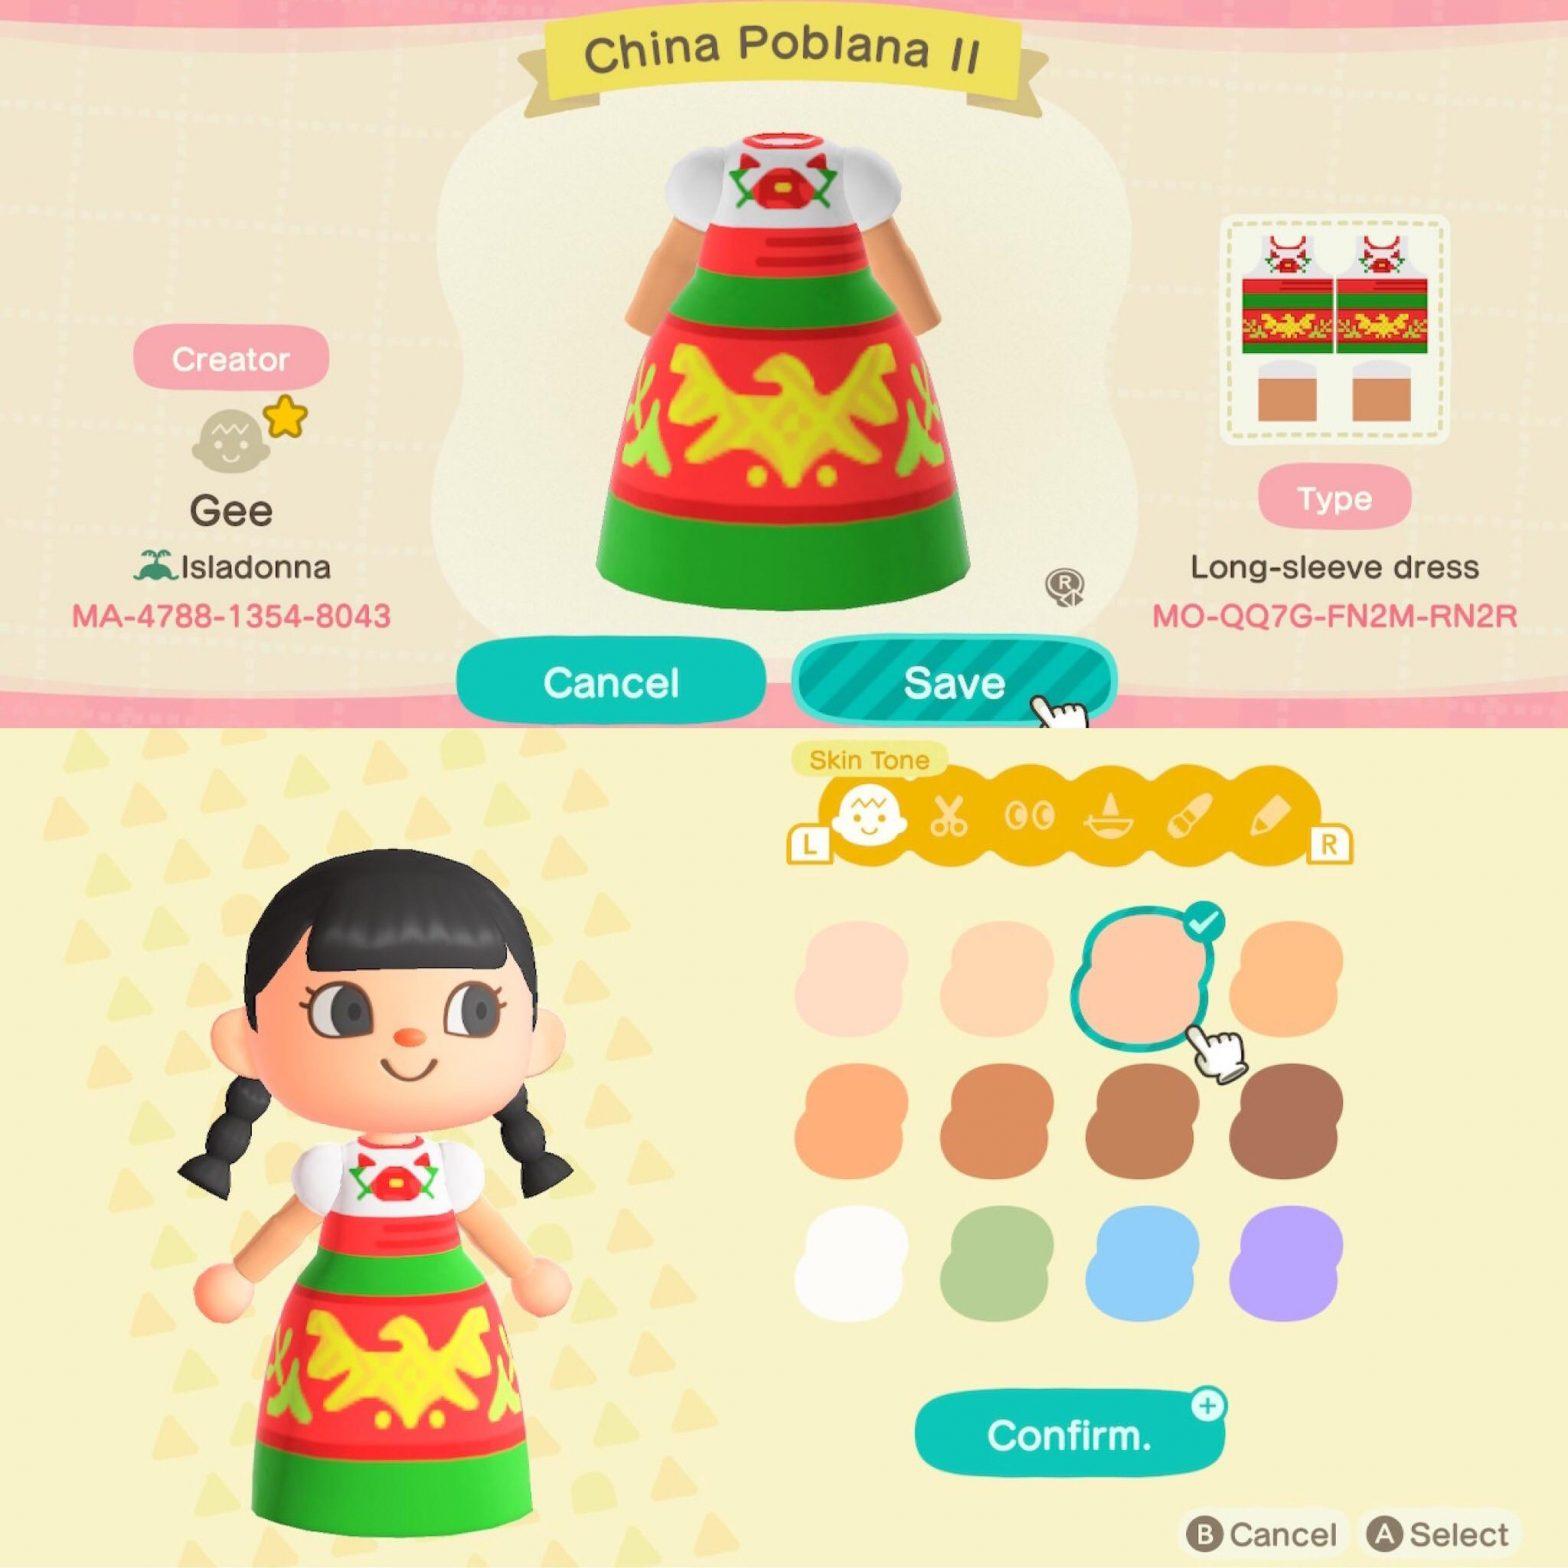 Mexican Dress series - China Poblana II